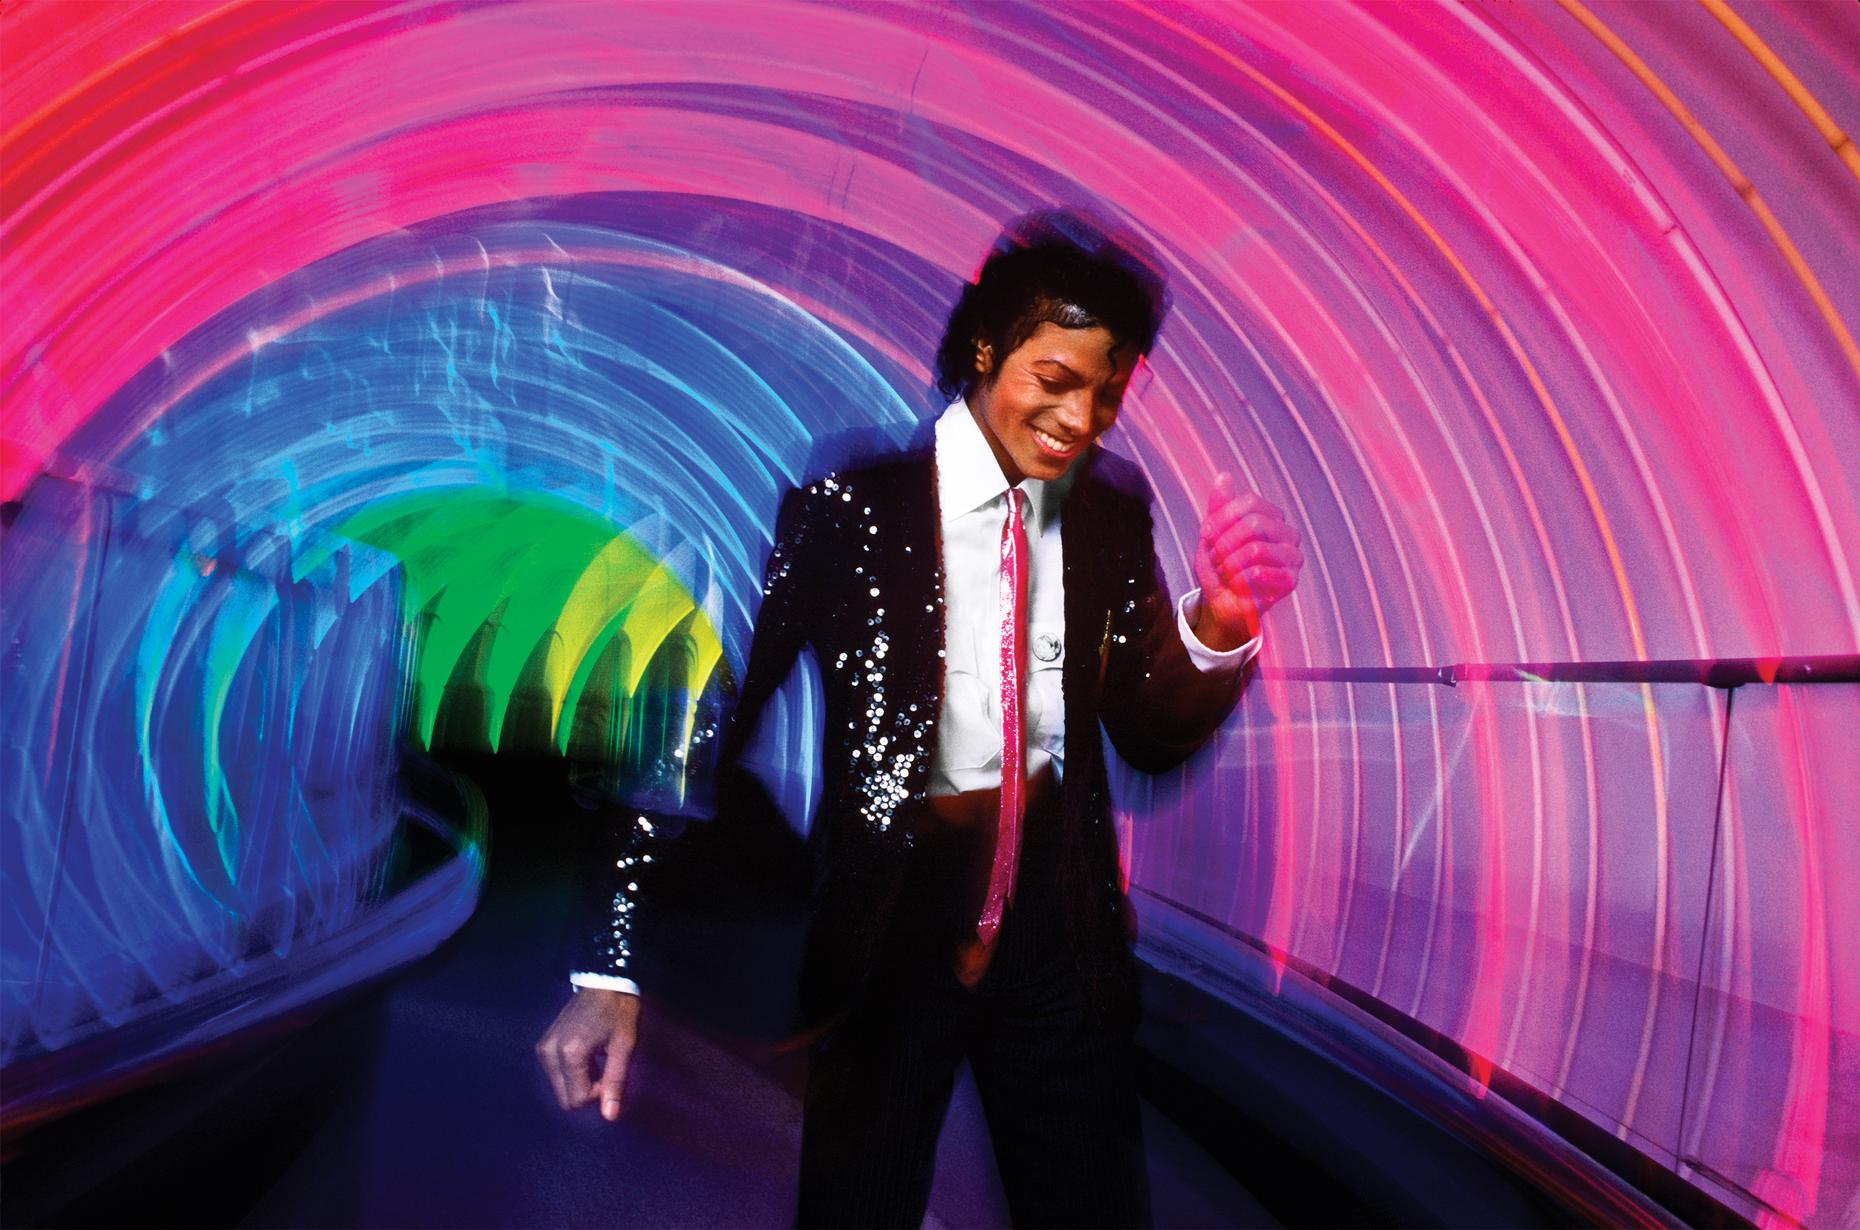 Michael Jackson photographed by Lynn Goldsmith at Disney World, 1984